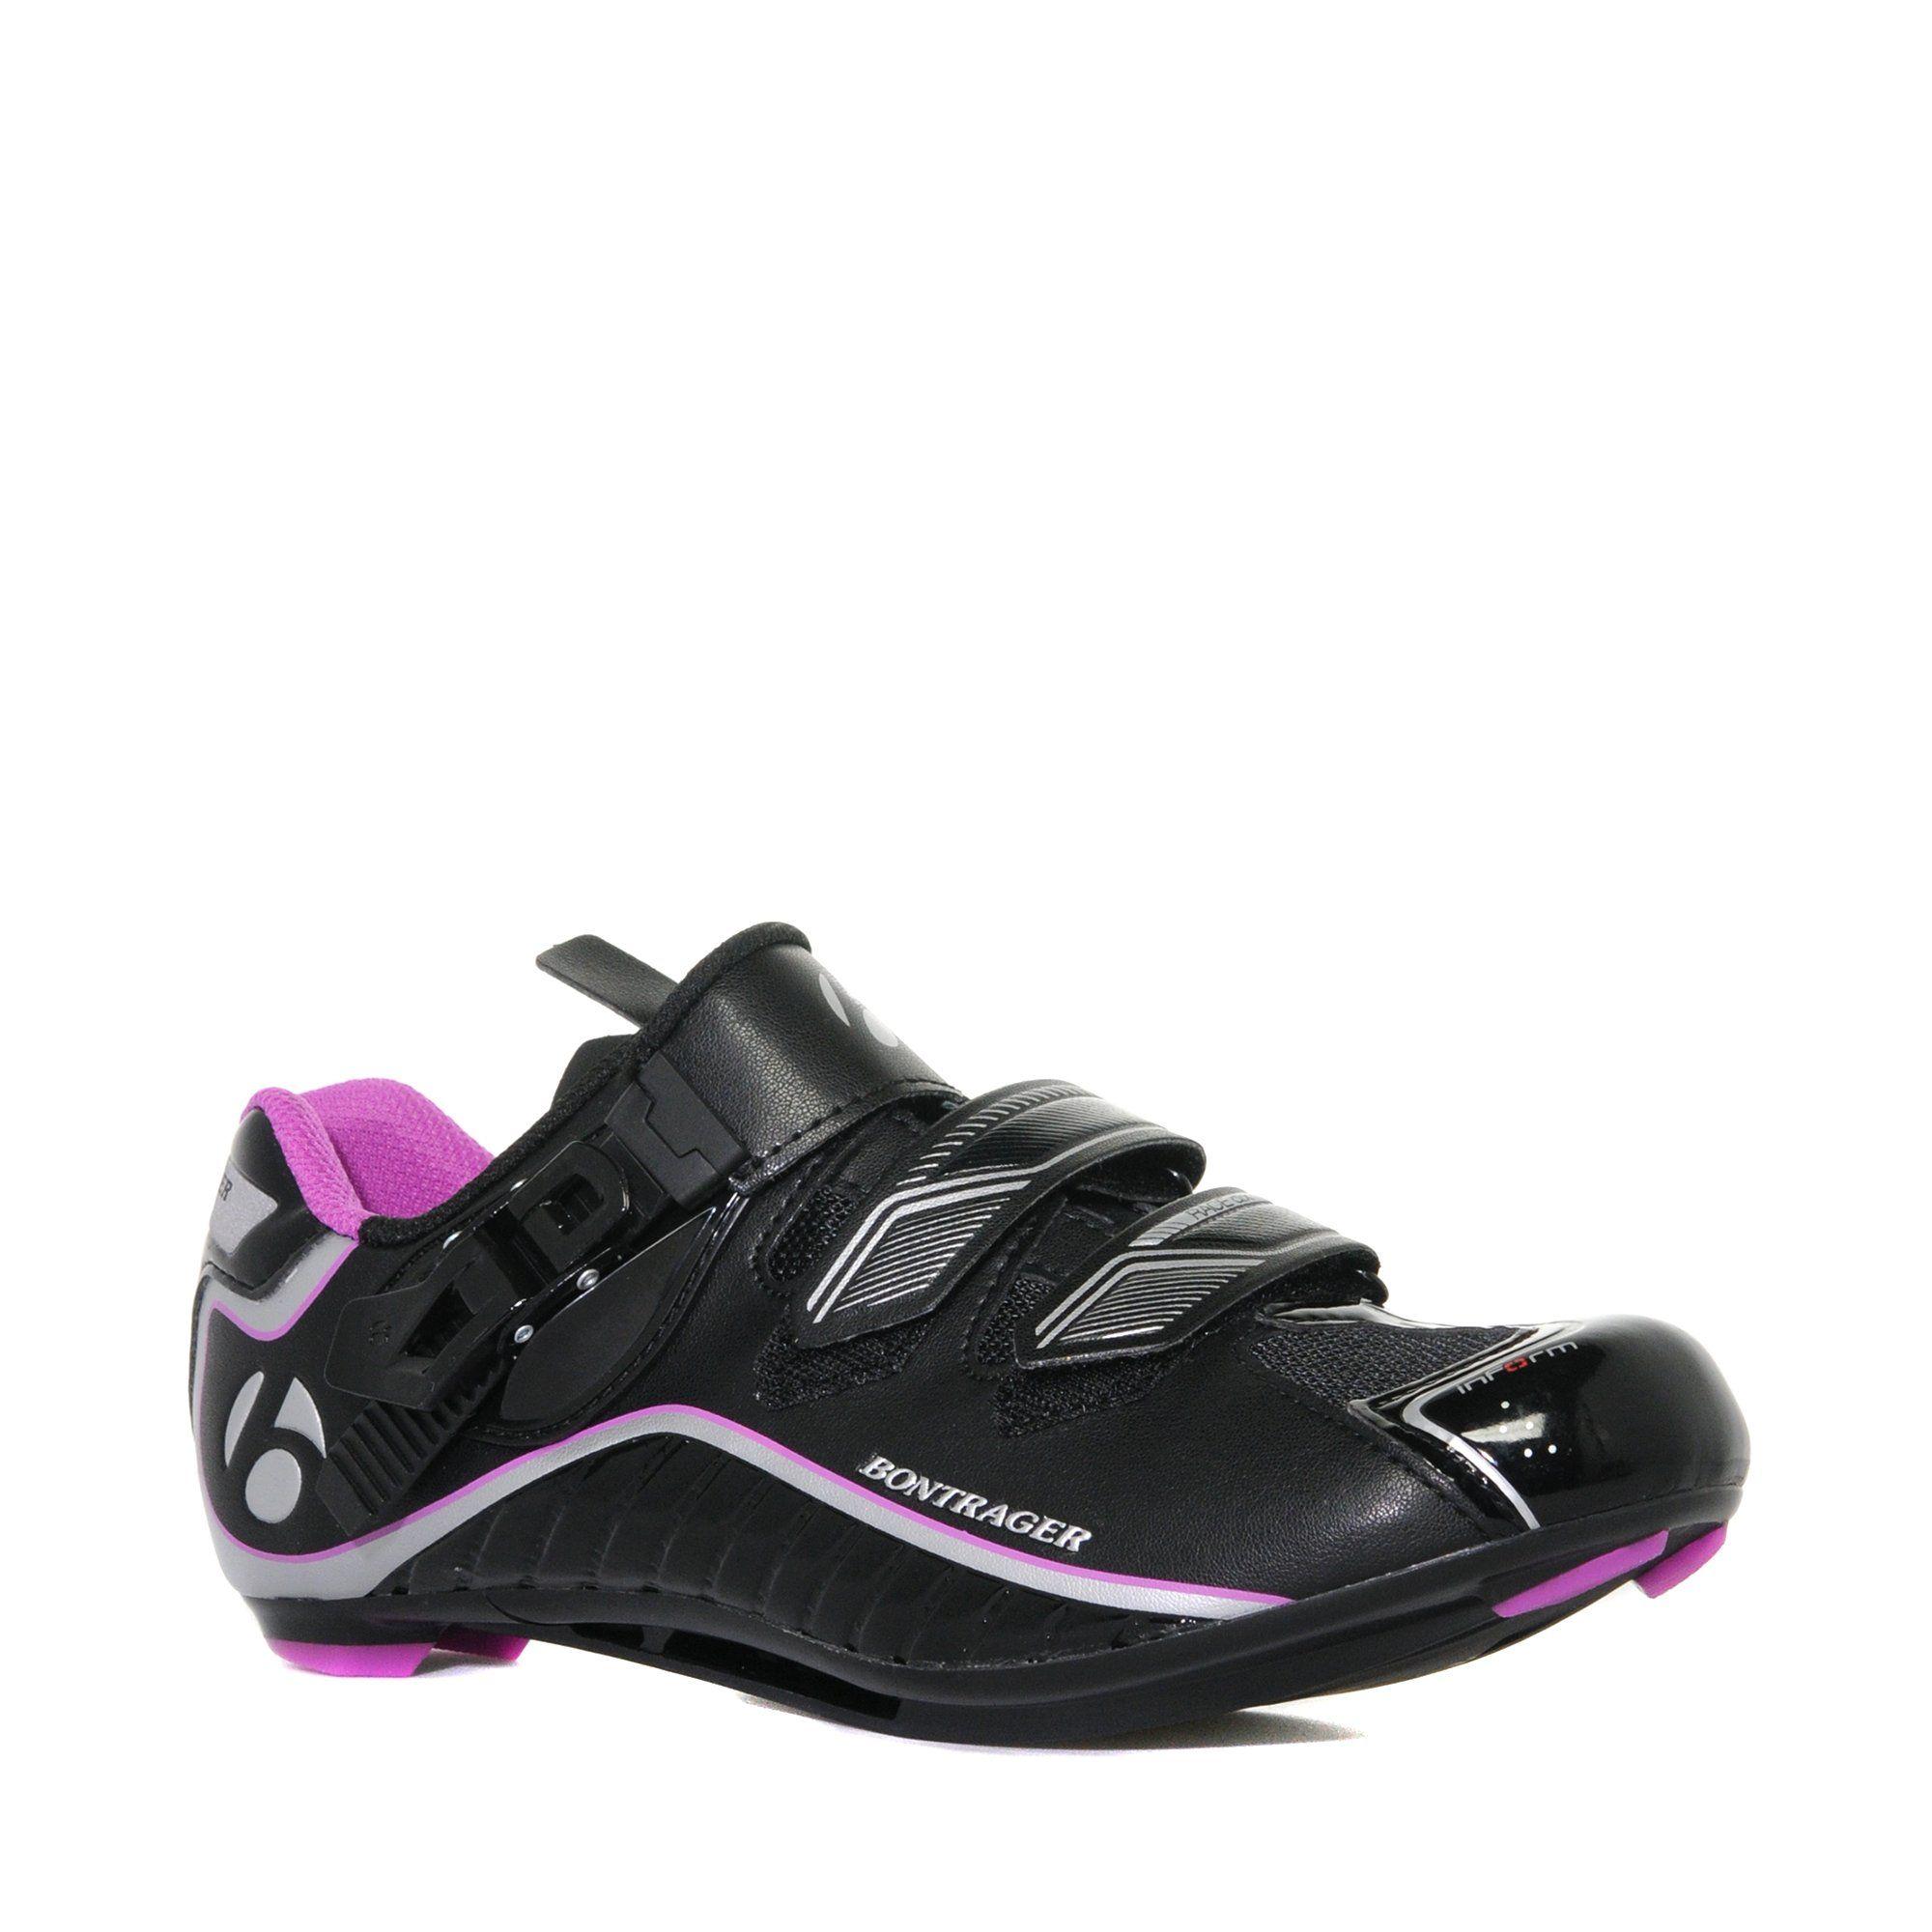 BONTRAGER Women's RC DLX WSD Road Bike Shoe